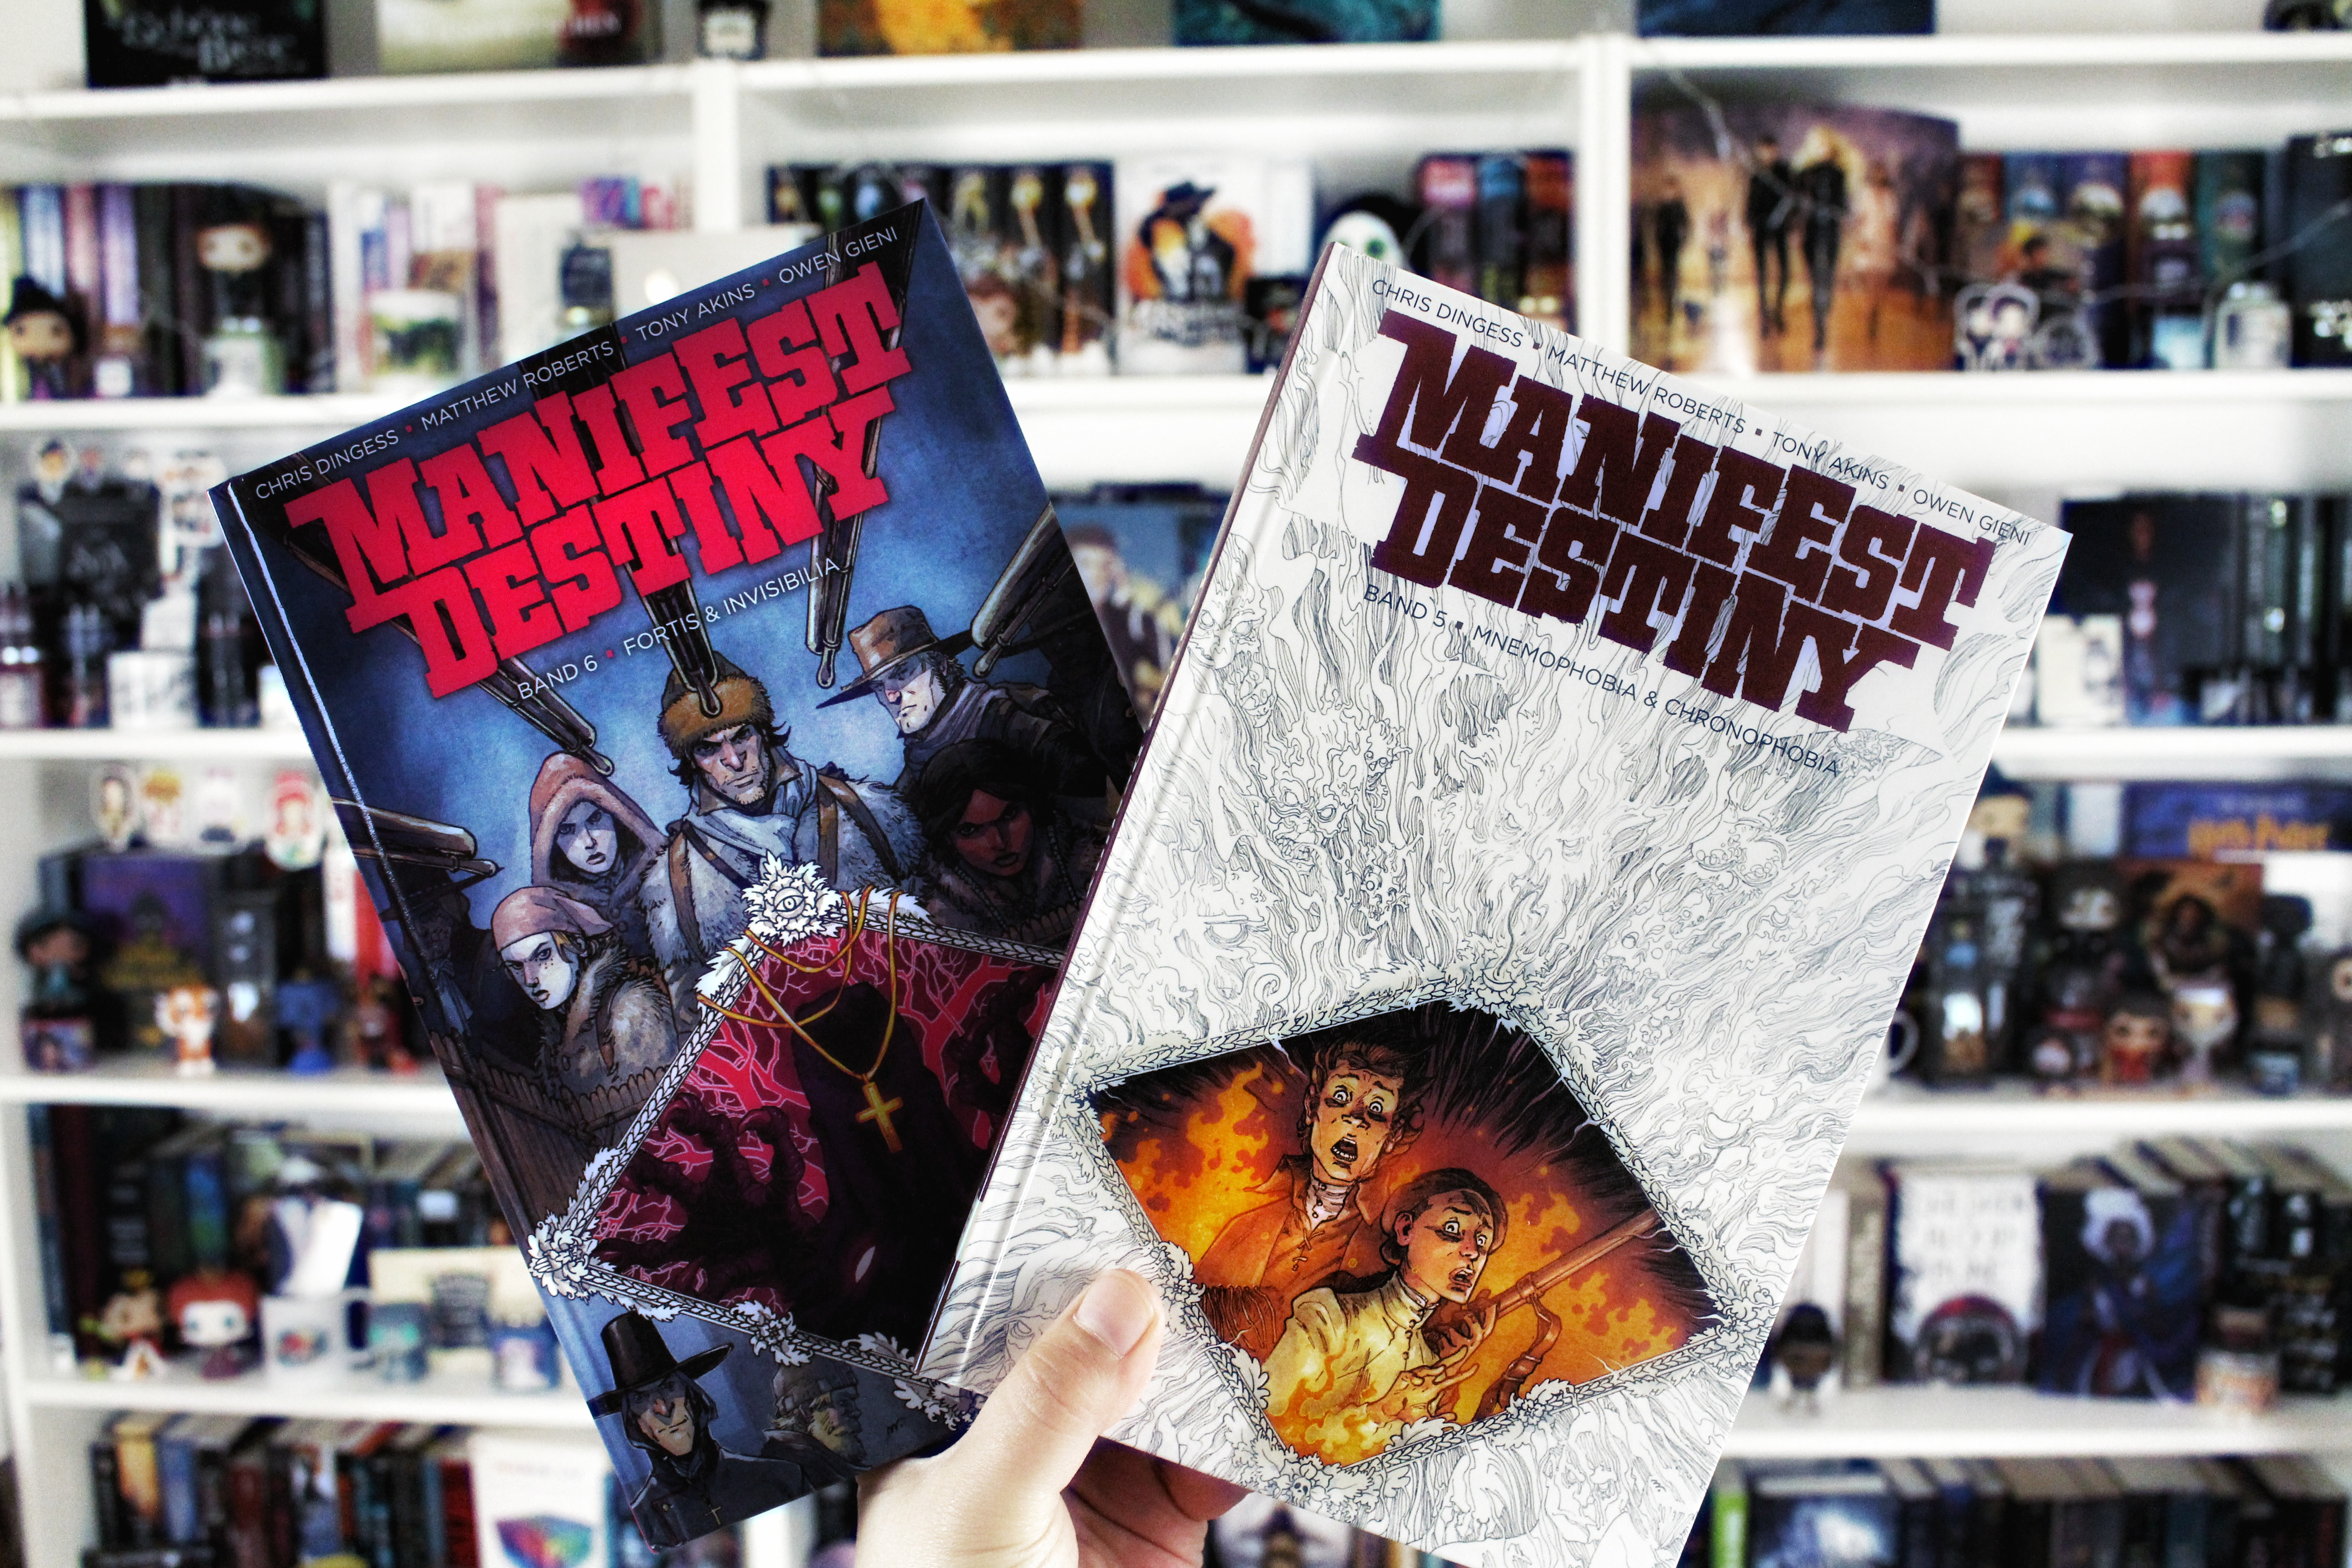 Rezension | Manifest Destiny Bd. 5 & 6 von Dingess, Roberts & Gieni